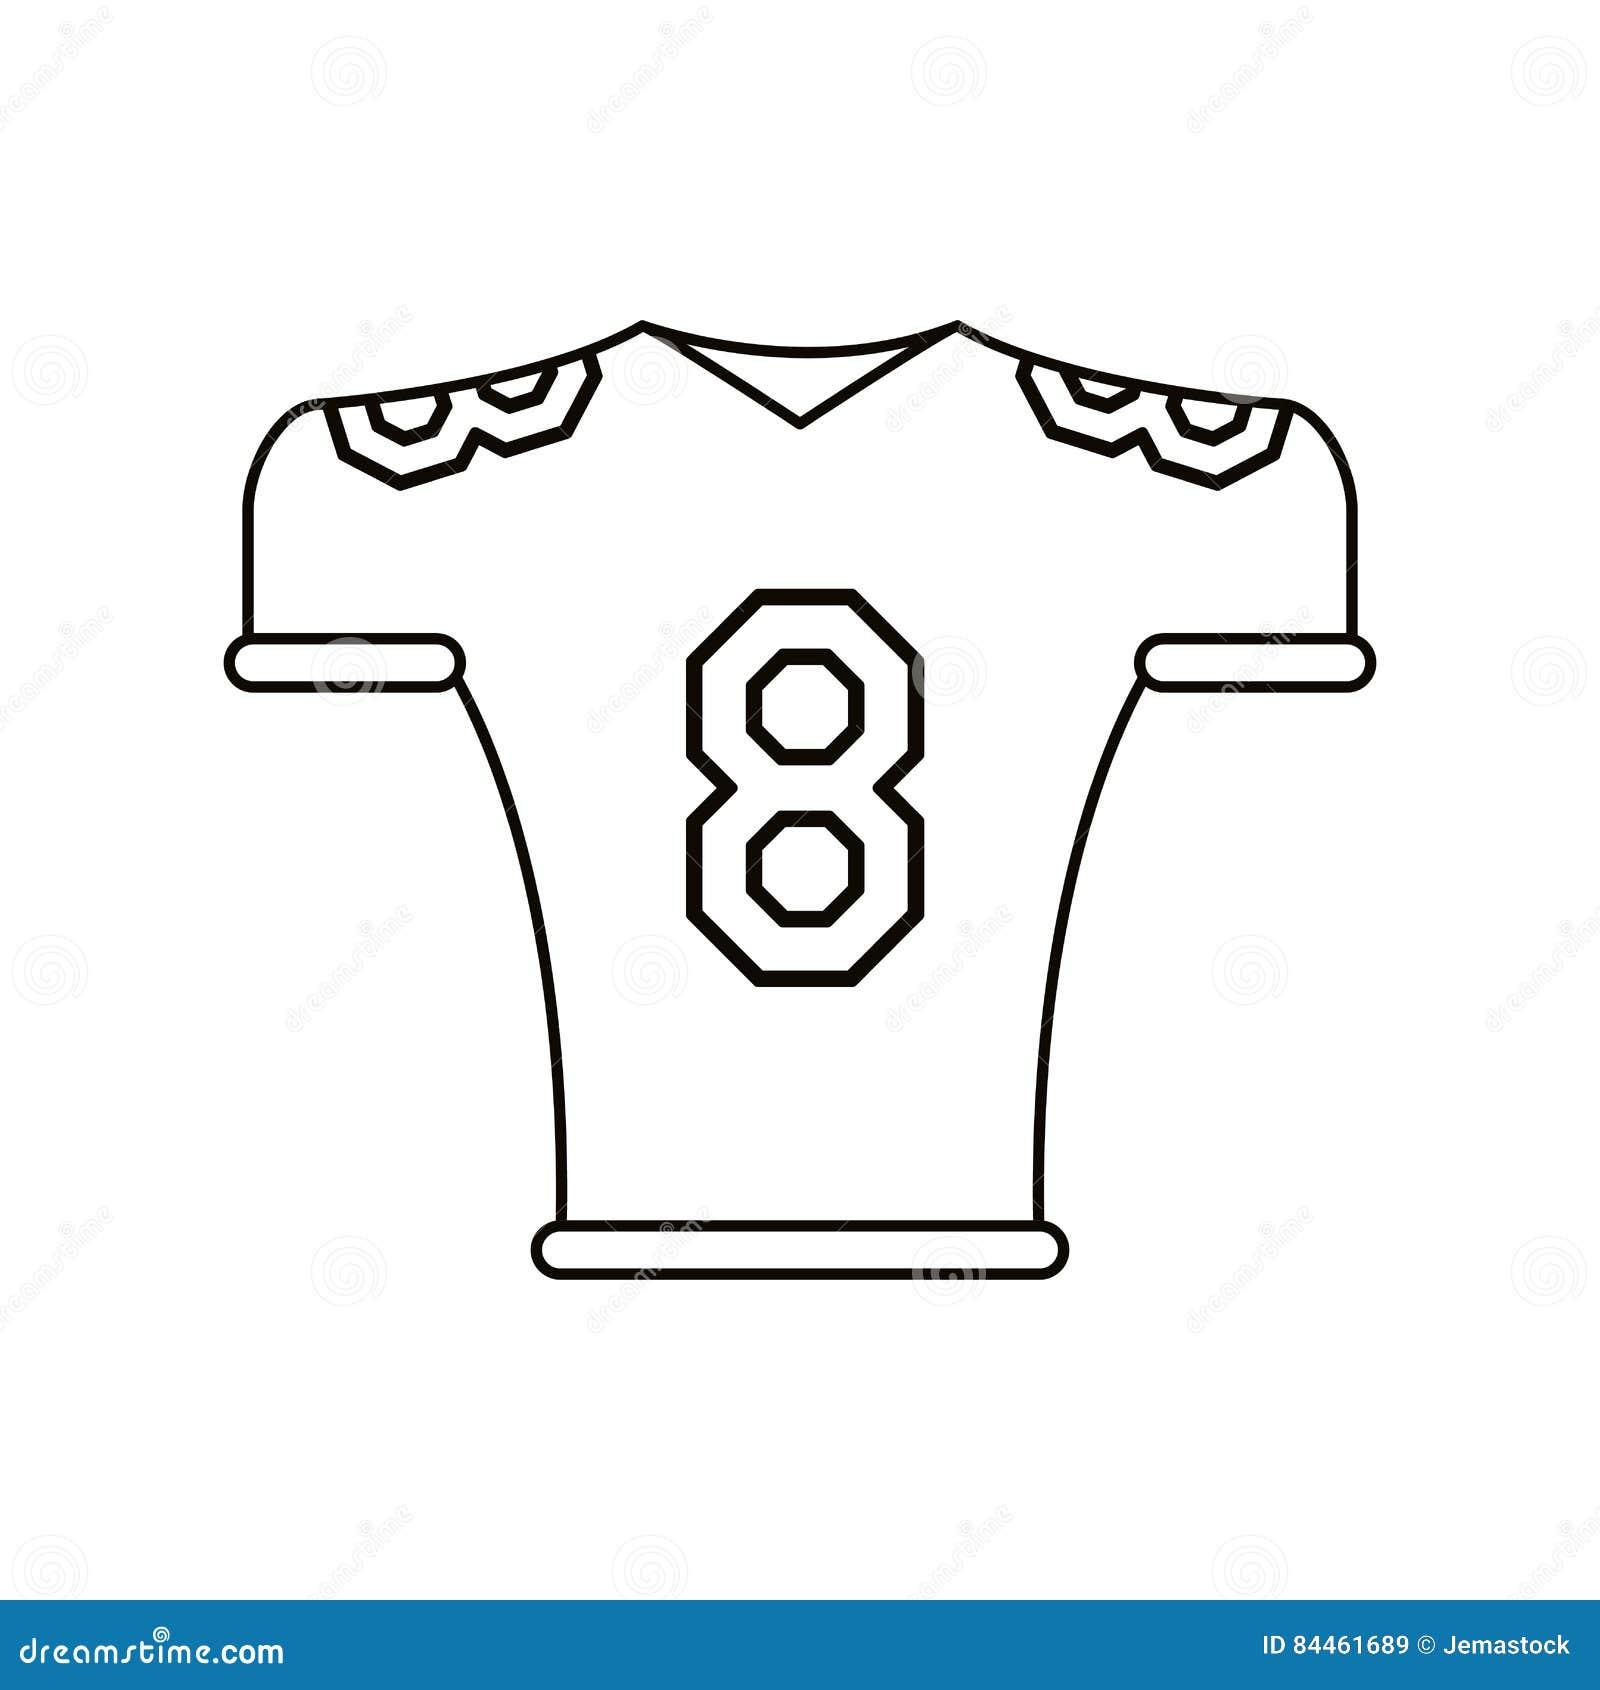 Line Art Jersey : American football jersey uniform tshirt outline stock